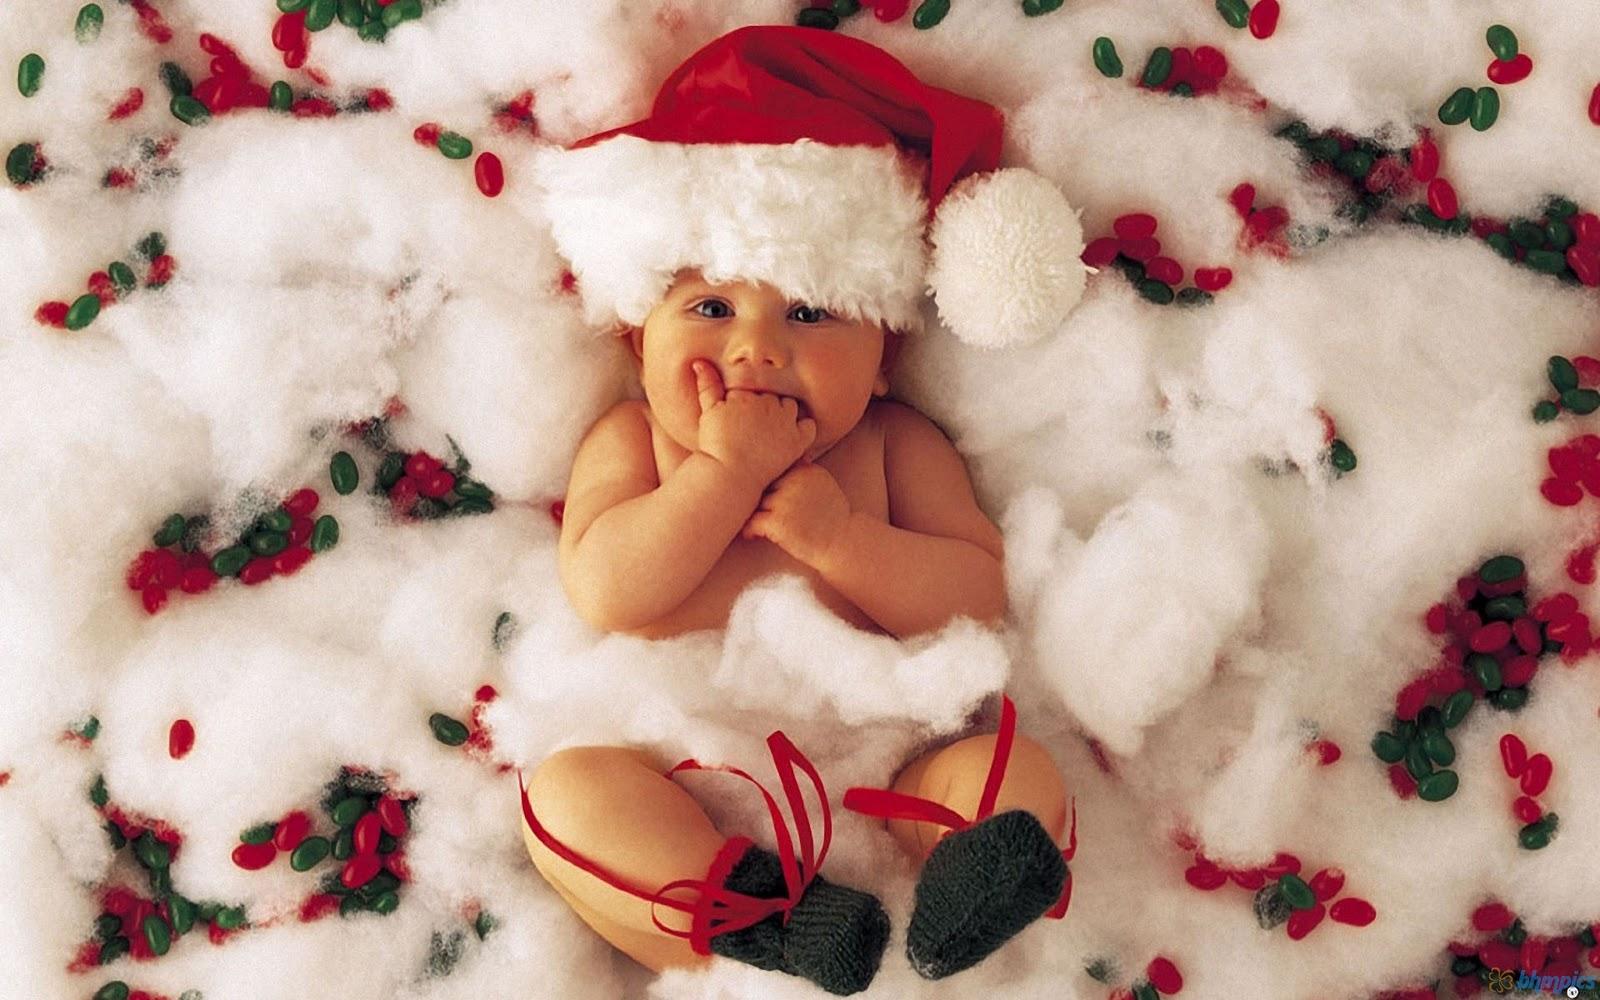 http://4.bp.blogspot.com/-MJfXZ3WGq4w/Tug6THsLRpI/AAAAAAAAAbk/pypQCTegAPQ/s1600/christmas_baby-1920x1200.jpg